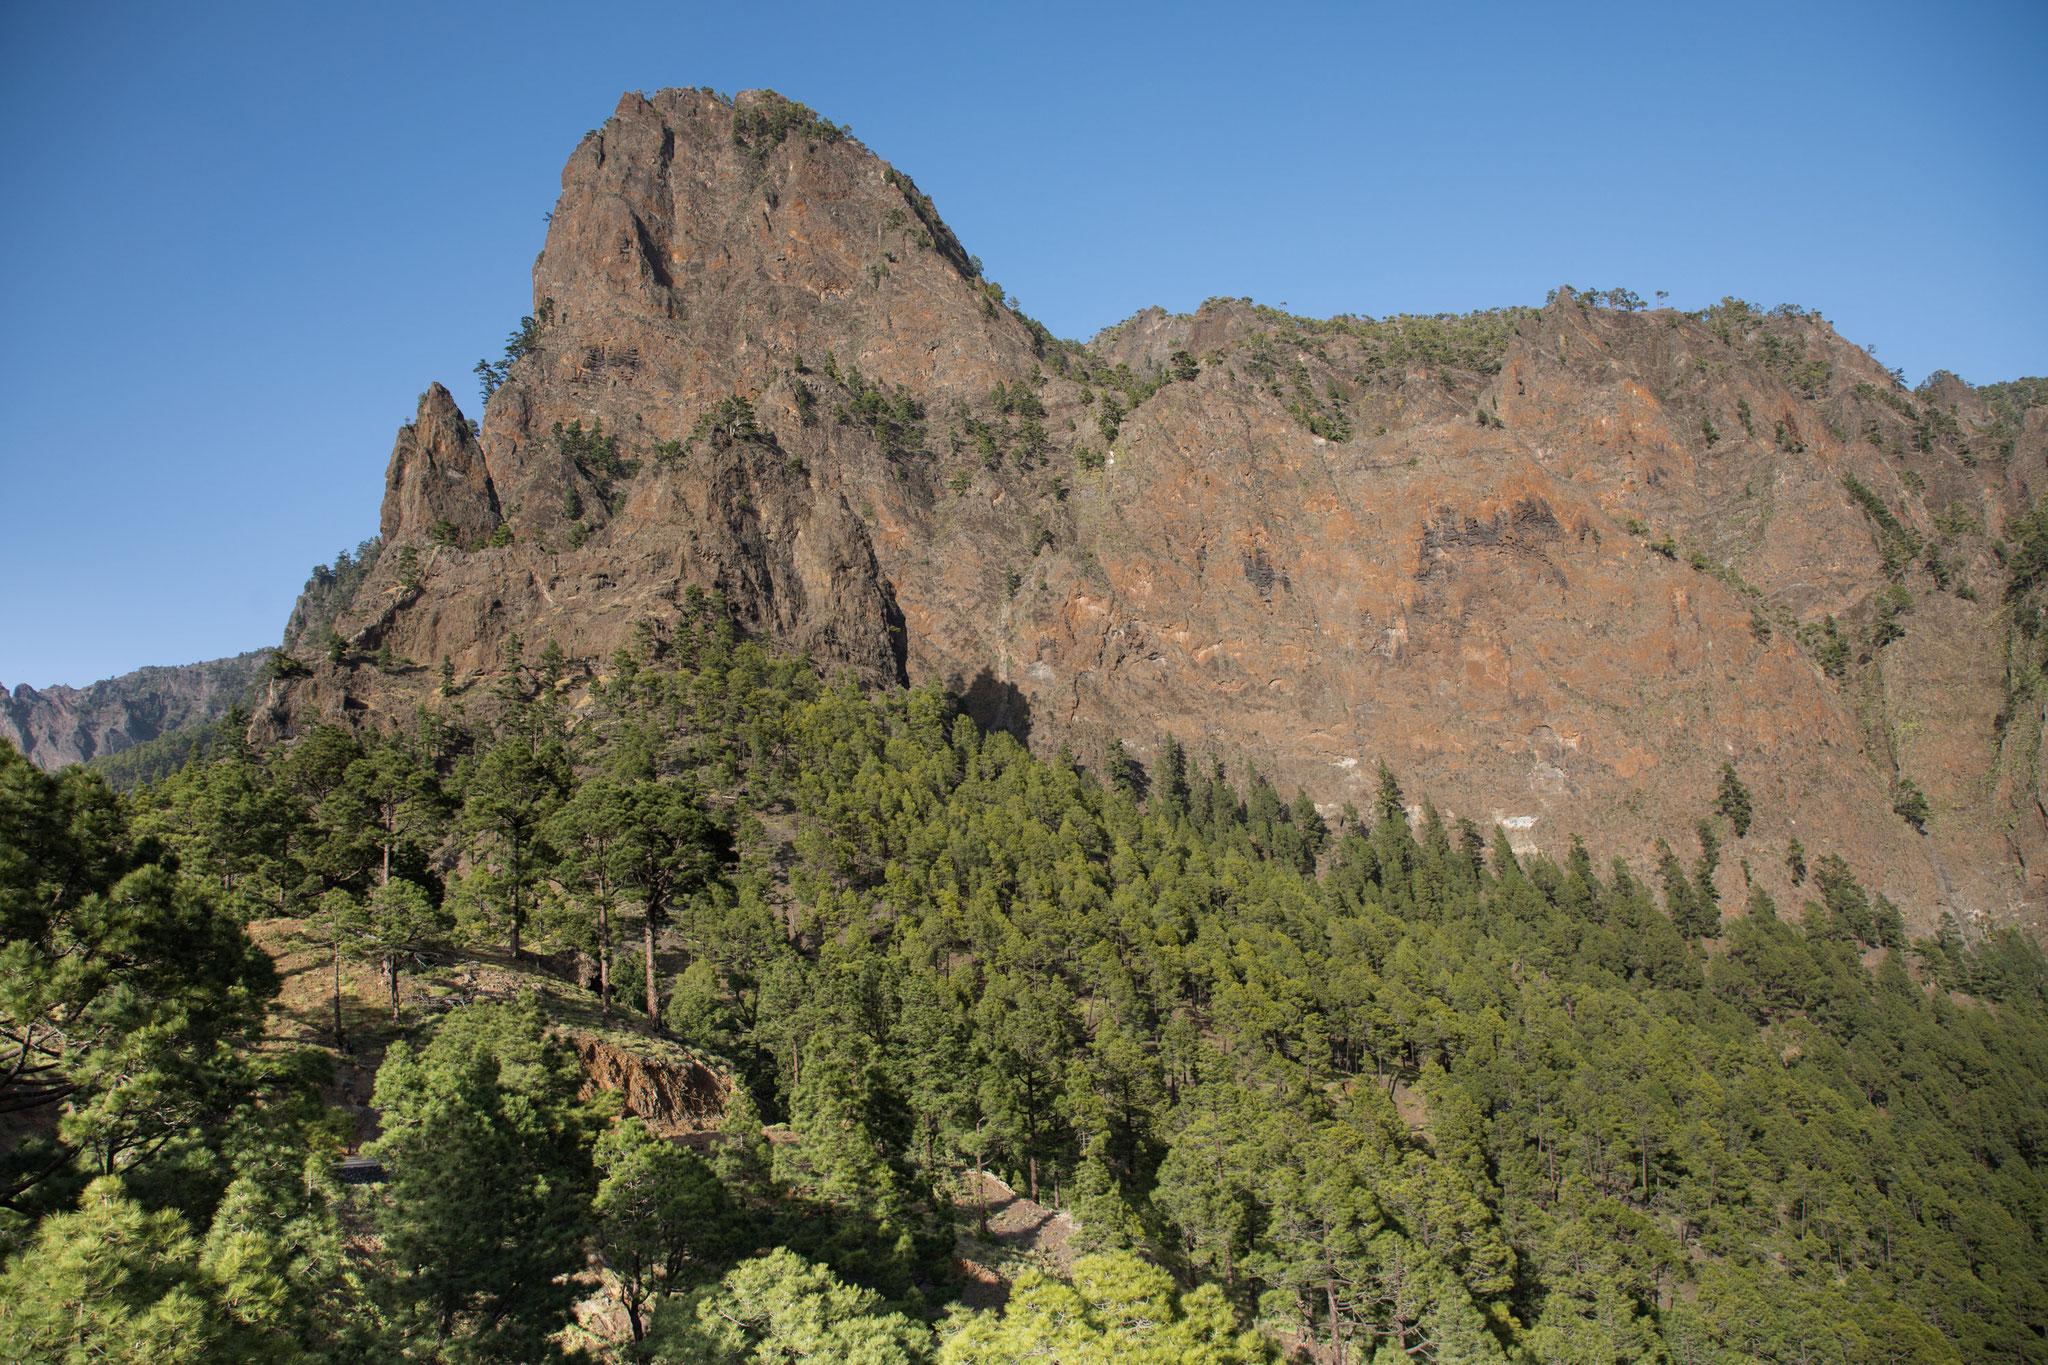 Nochmals Caldera de Taburiente - Wanderung vom Aussichtspunkt La Cumbrecita